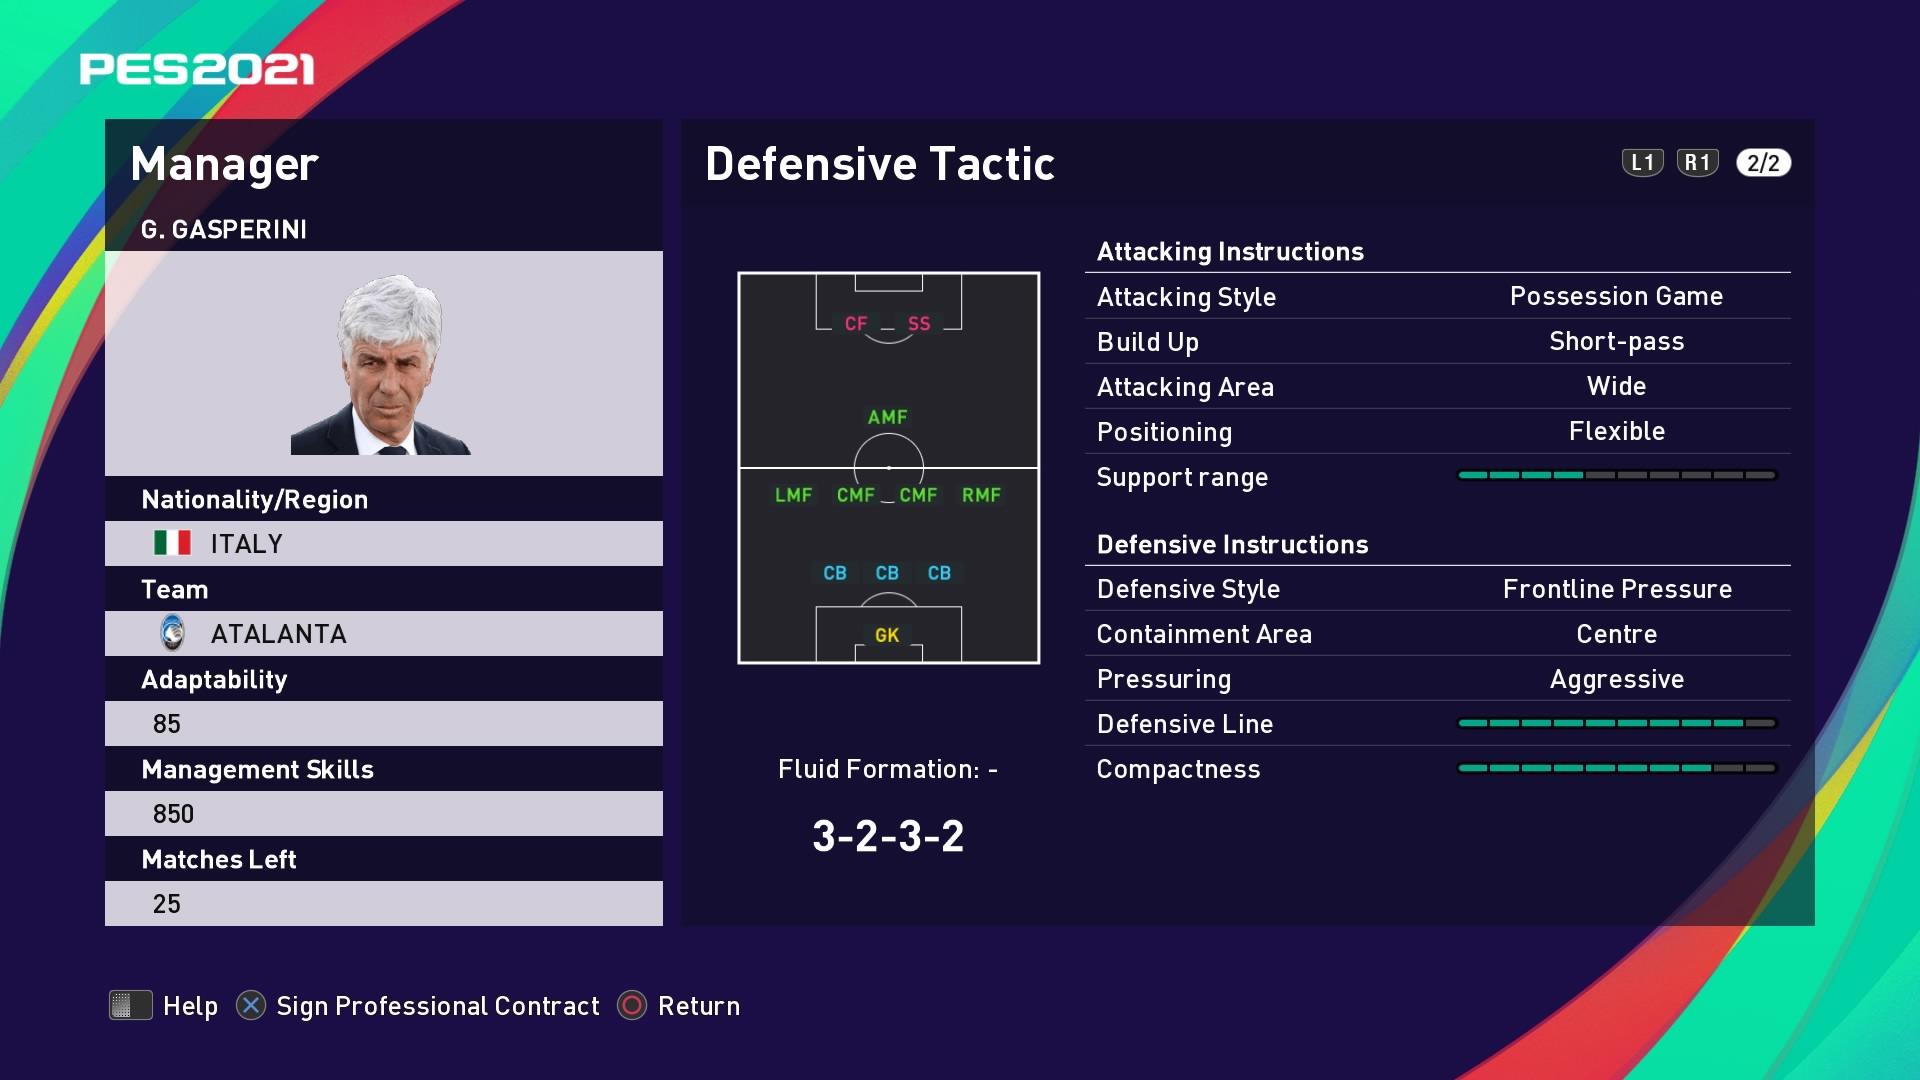 G. Gasperini (Gian Piero Gasperini) Defensive Tactic in PES 2021 myClub